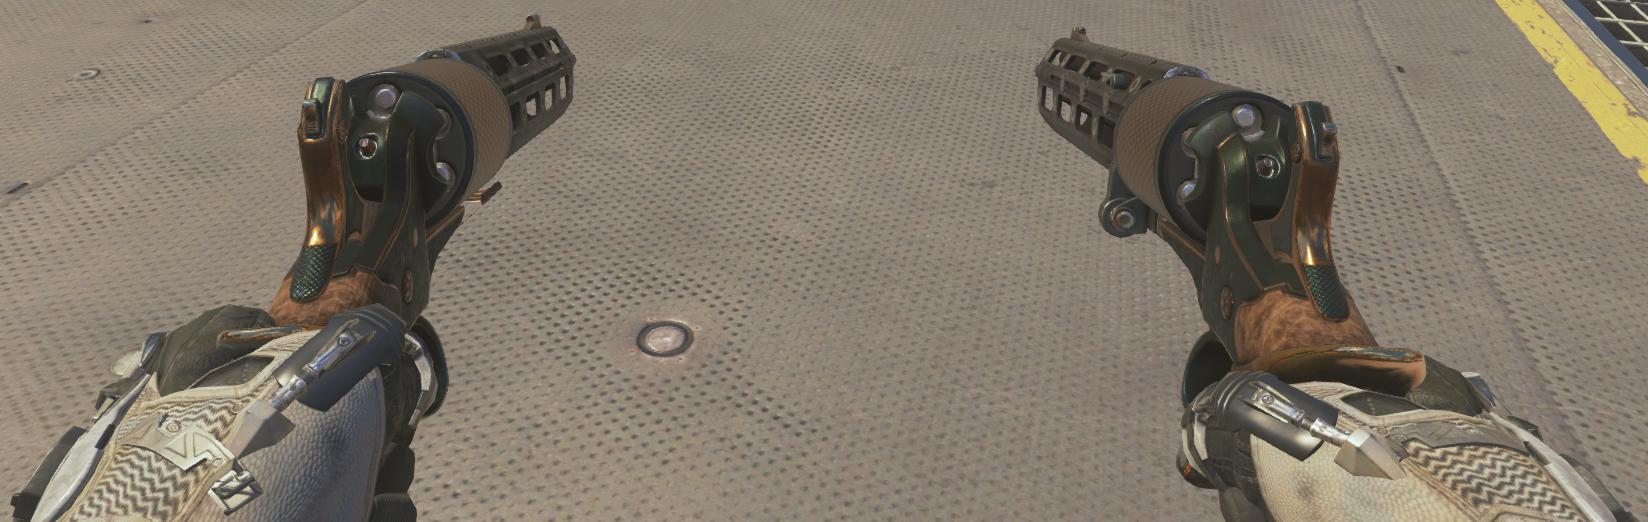 M1 Irons/Variants